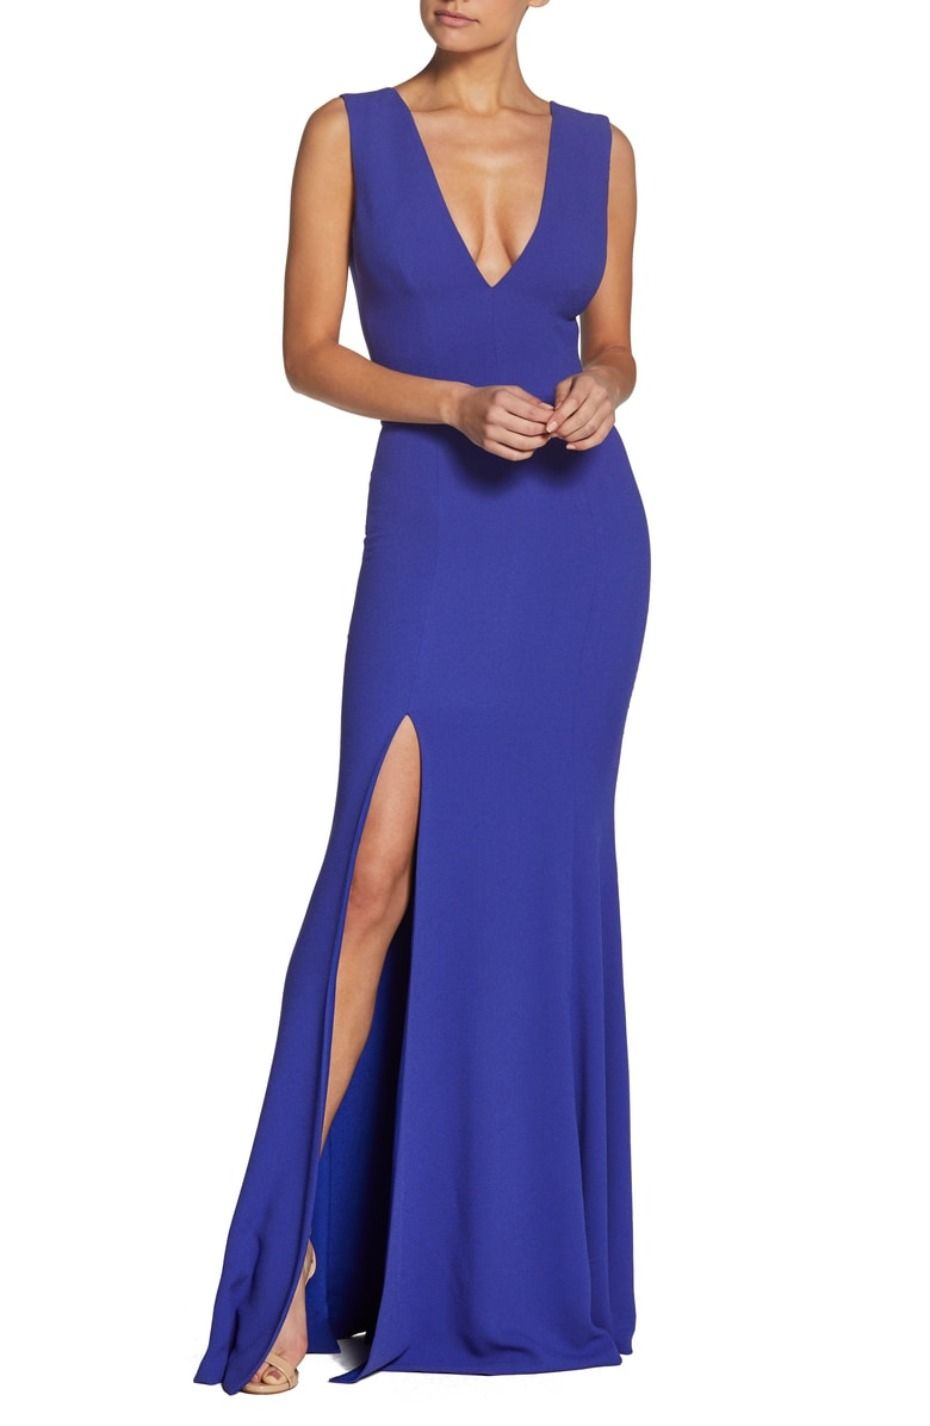 Ririus cobalt blue bridesmaid dress is goals for the girls